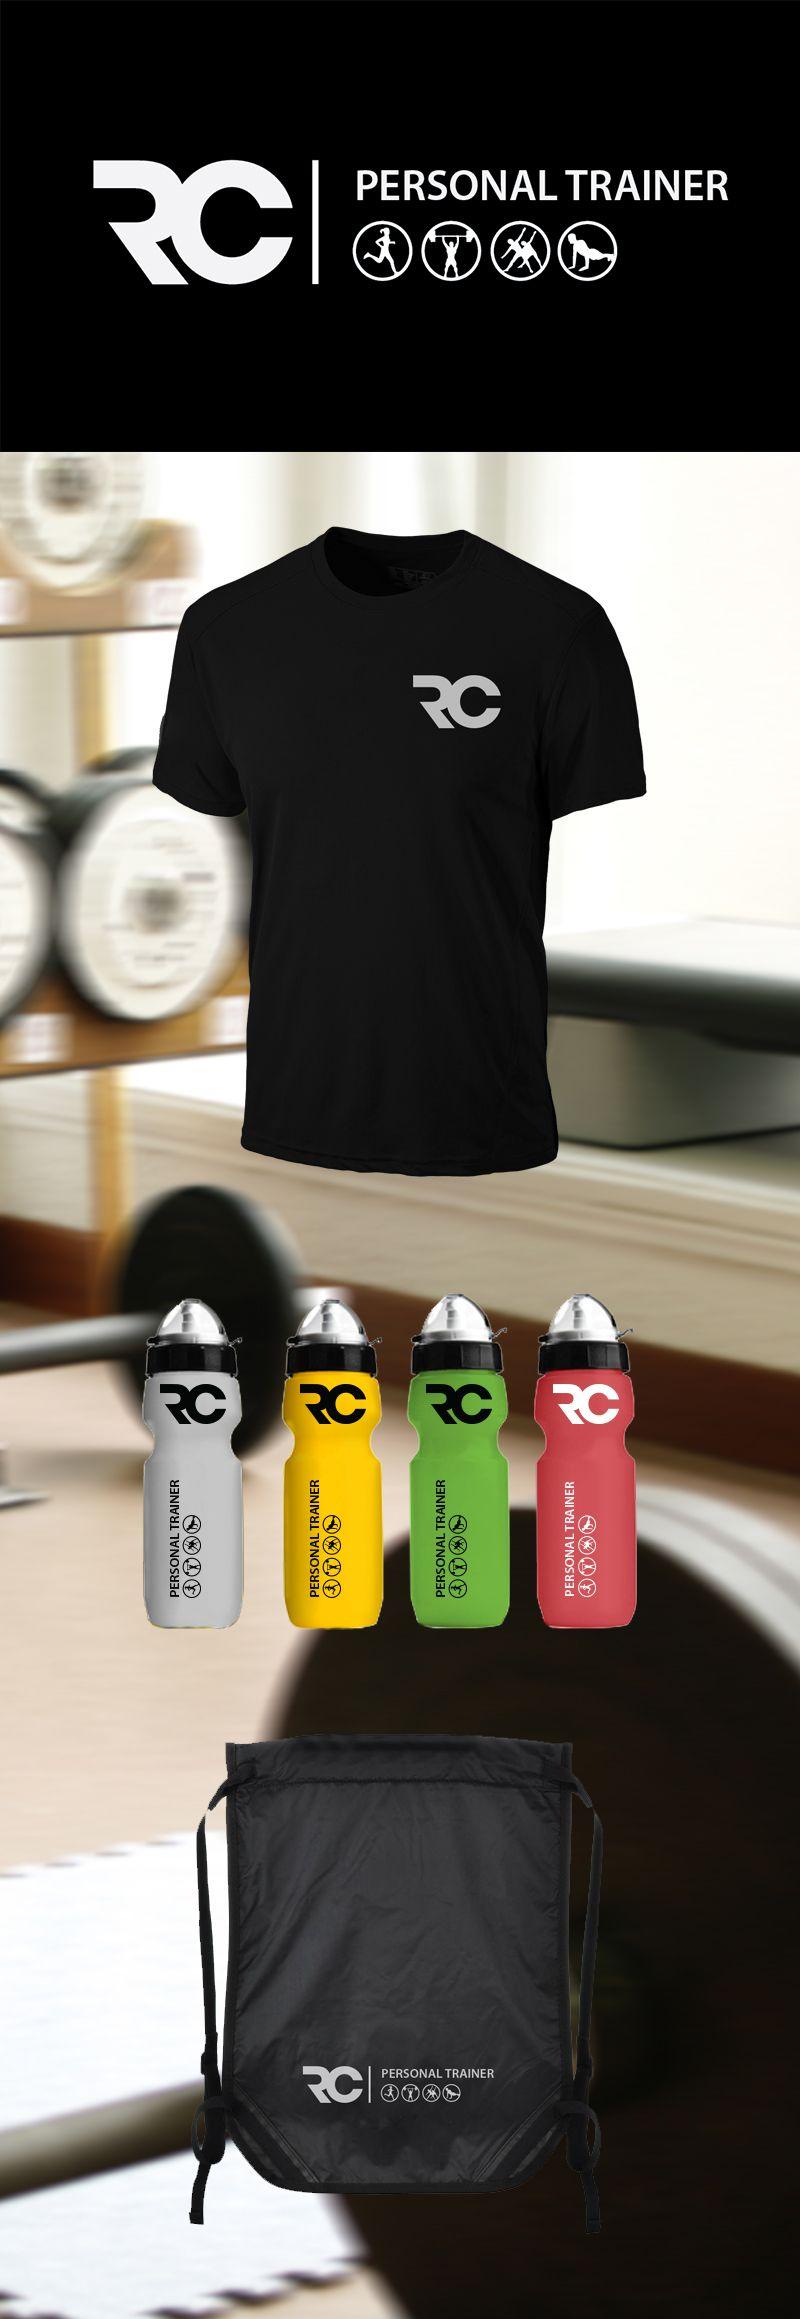 Rc Personal Trainer On Behance Logotipo Fitness Cartao De Visita Logomarca